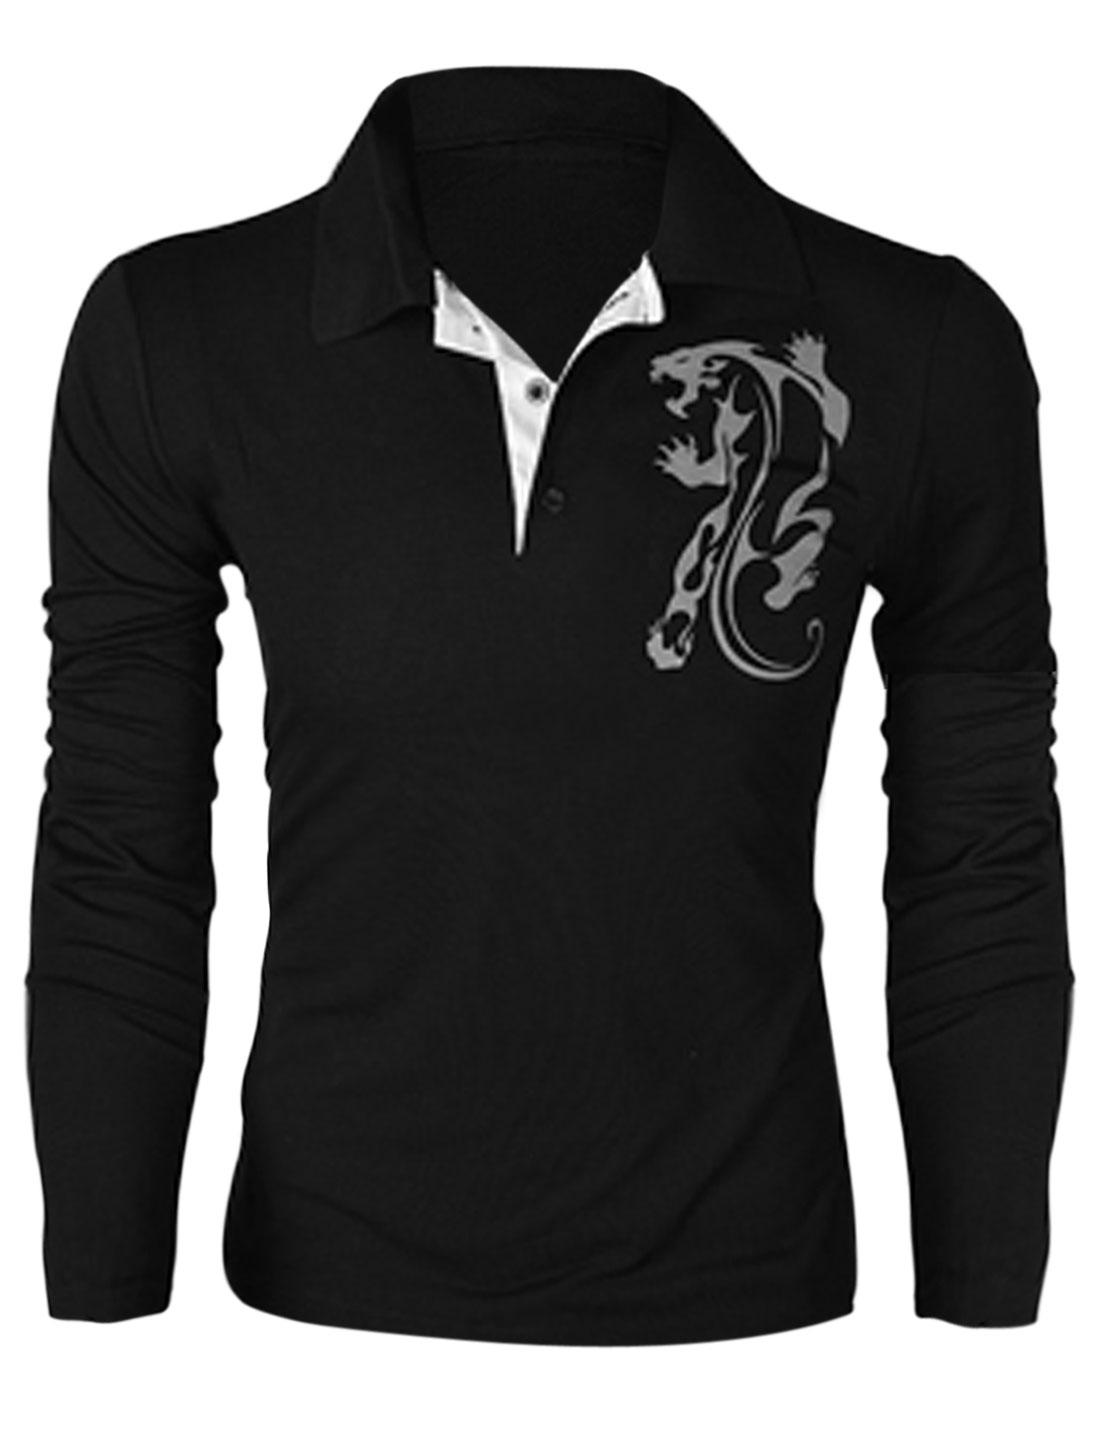 Men Point Collar Long Sleeve Cheetah Prints Polo Shirt Black M